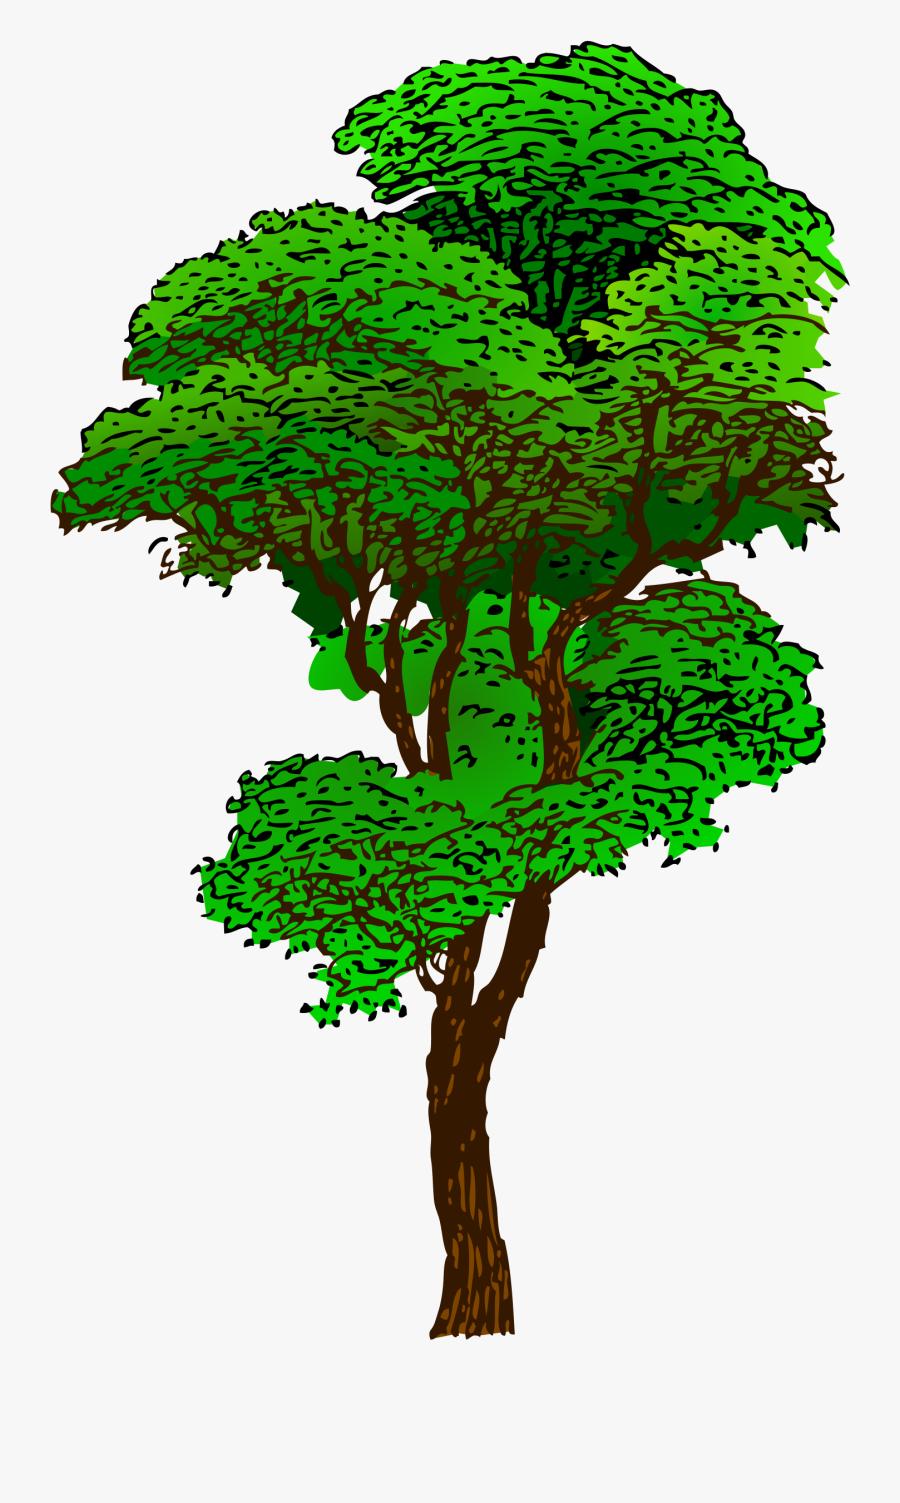 Tropical Rainforest Tree Clip Art - Tropical Rainforest Tree Clipart, Transparent Clipart